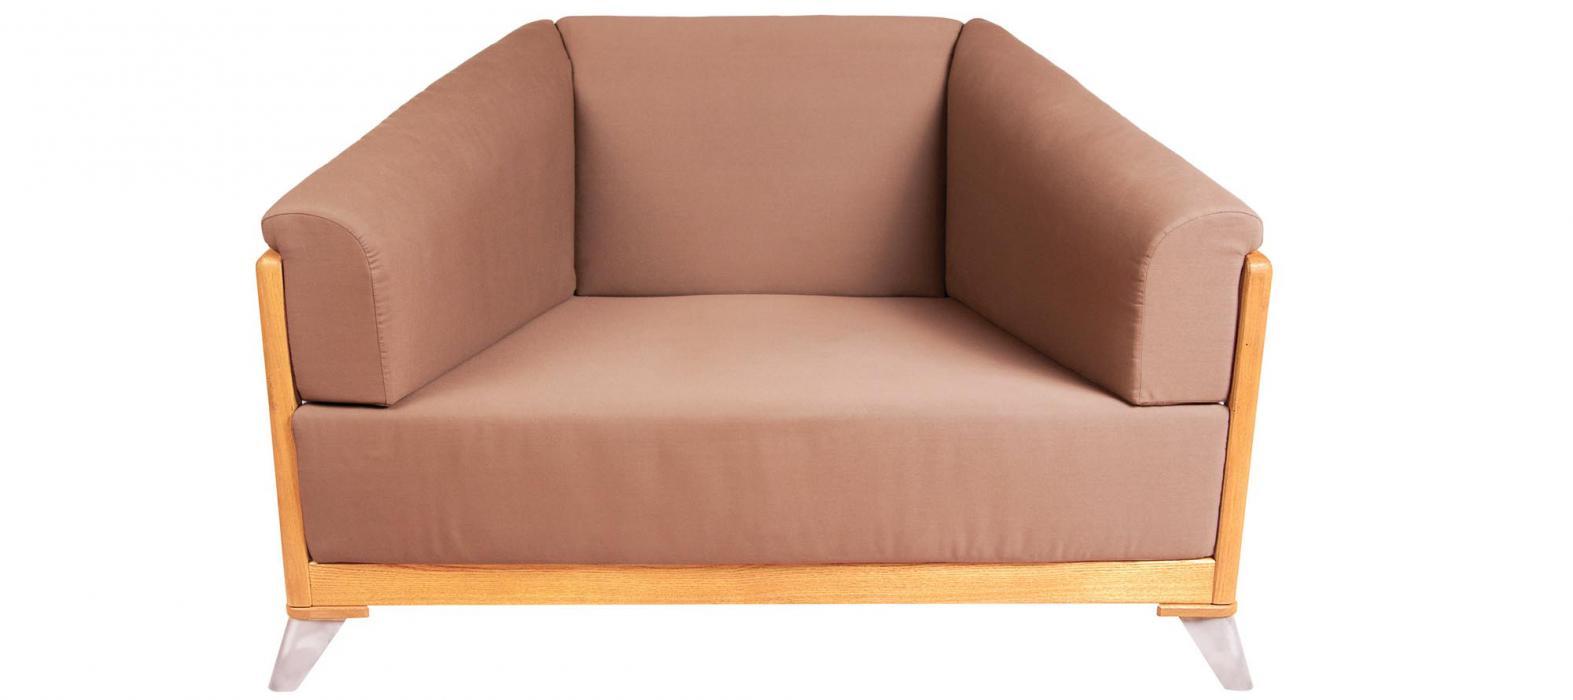 Fotel-Verona-020601